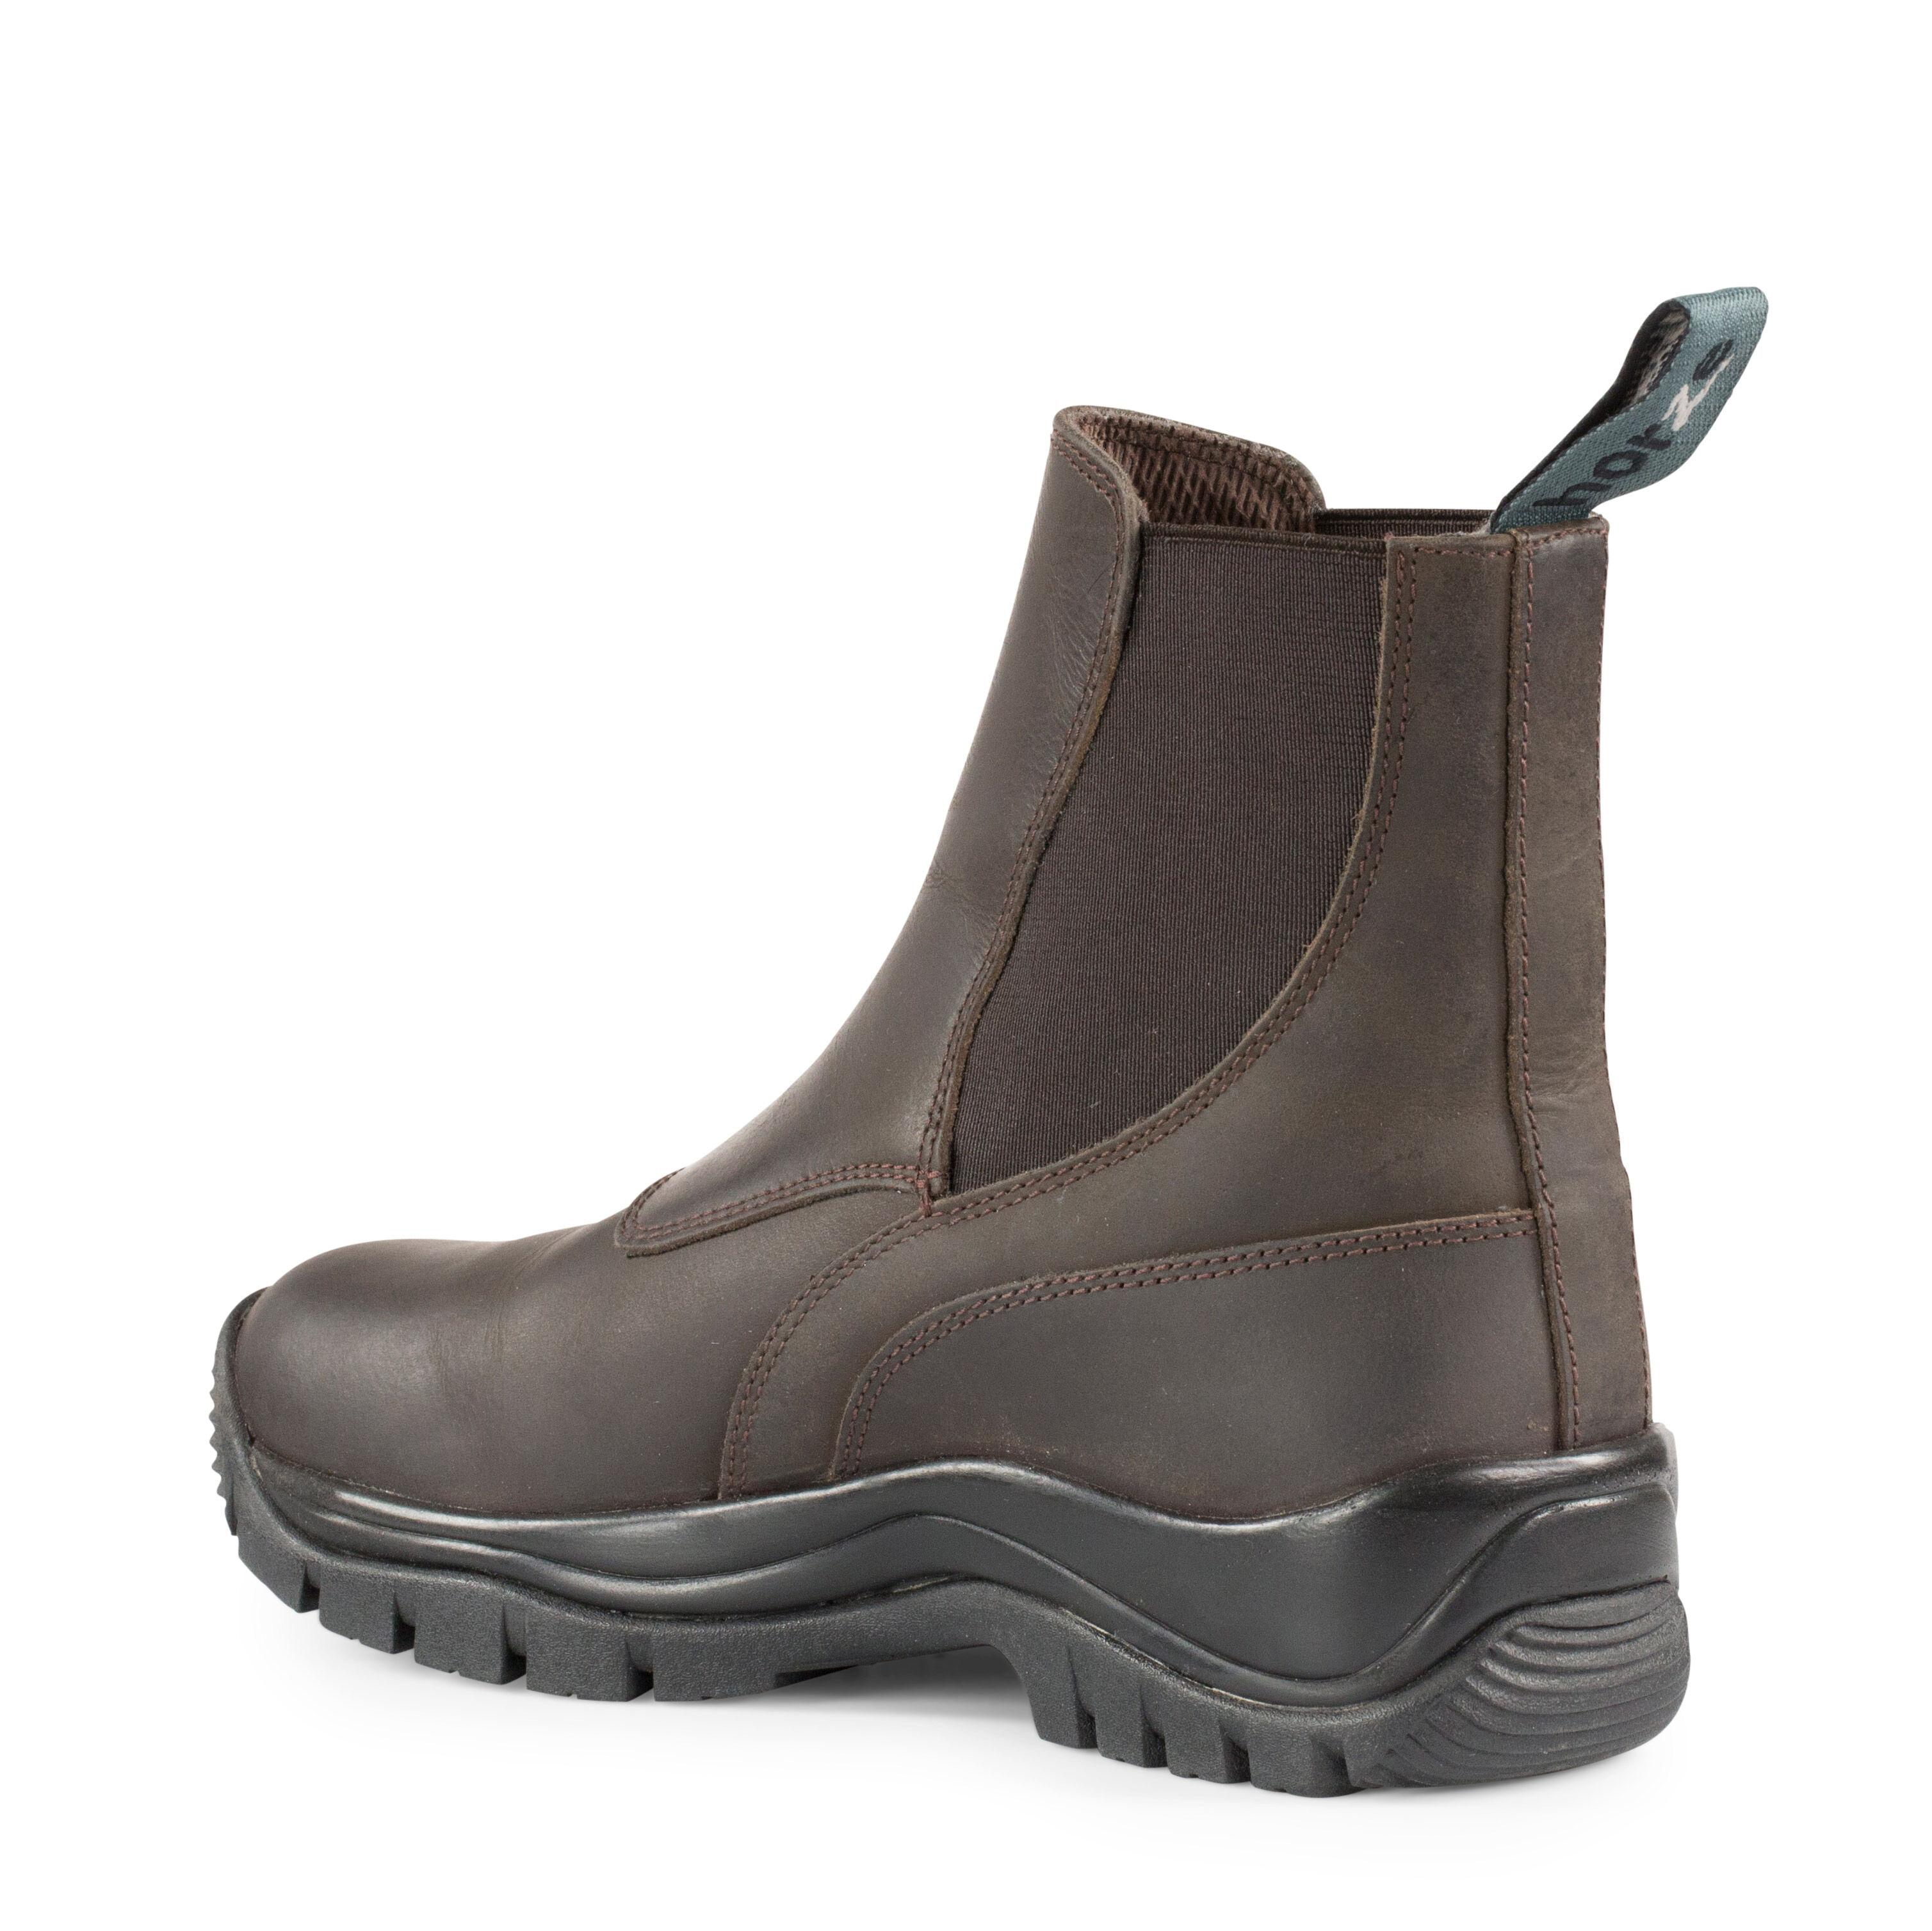 daba383a0211 Riding Boots & Accessories Horze Sporty Jodhpur Boots